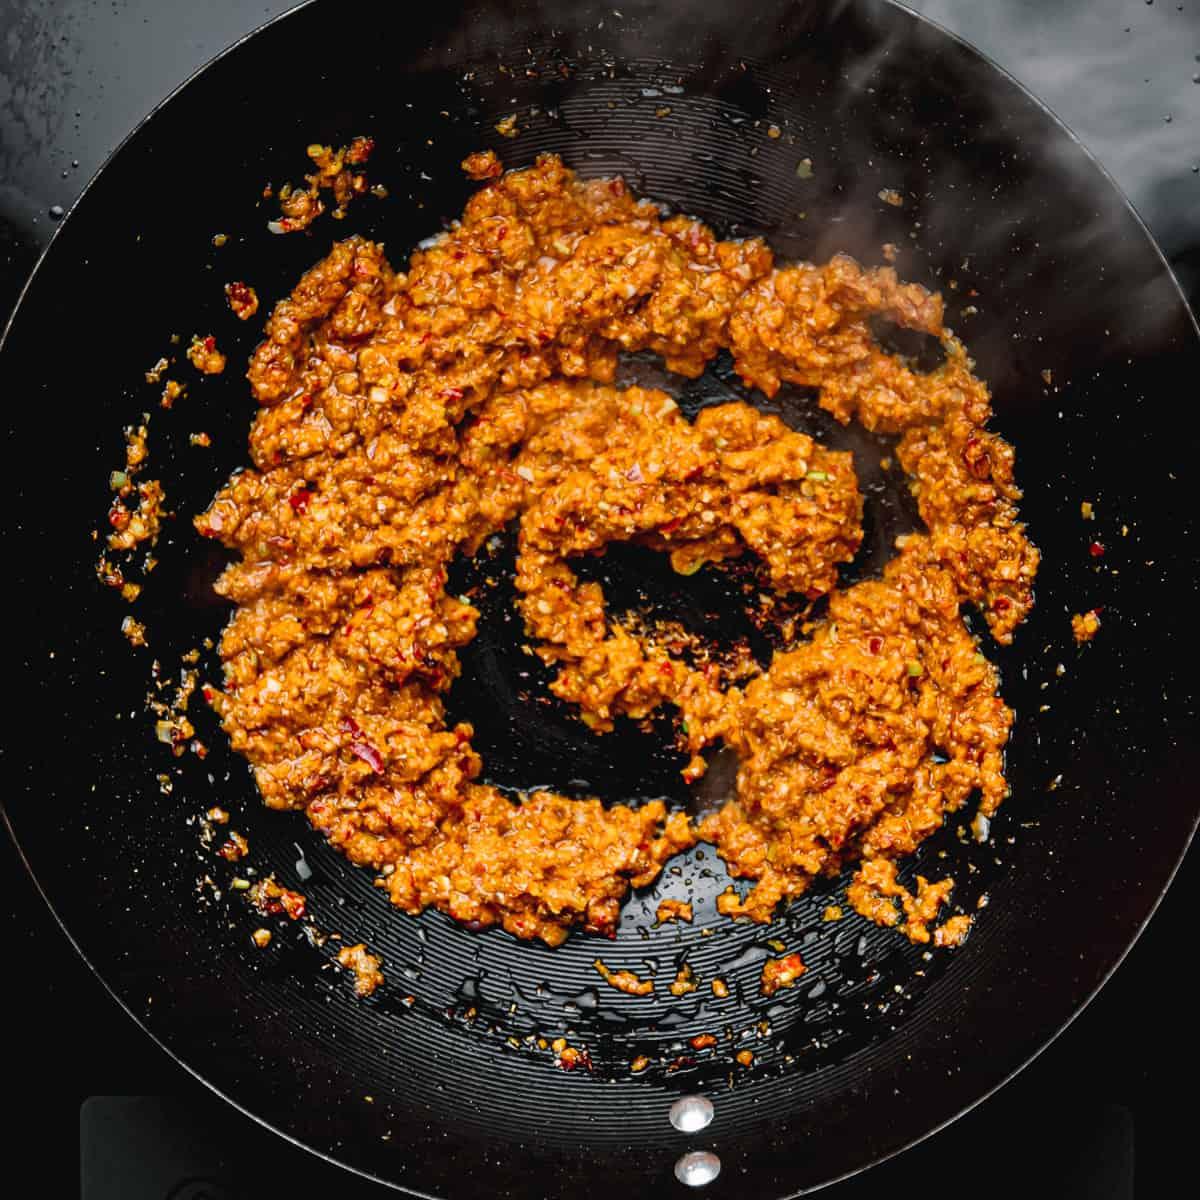 A good recipe for laksa paste.